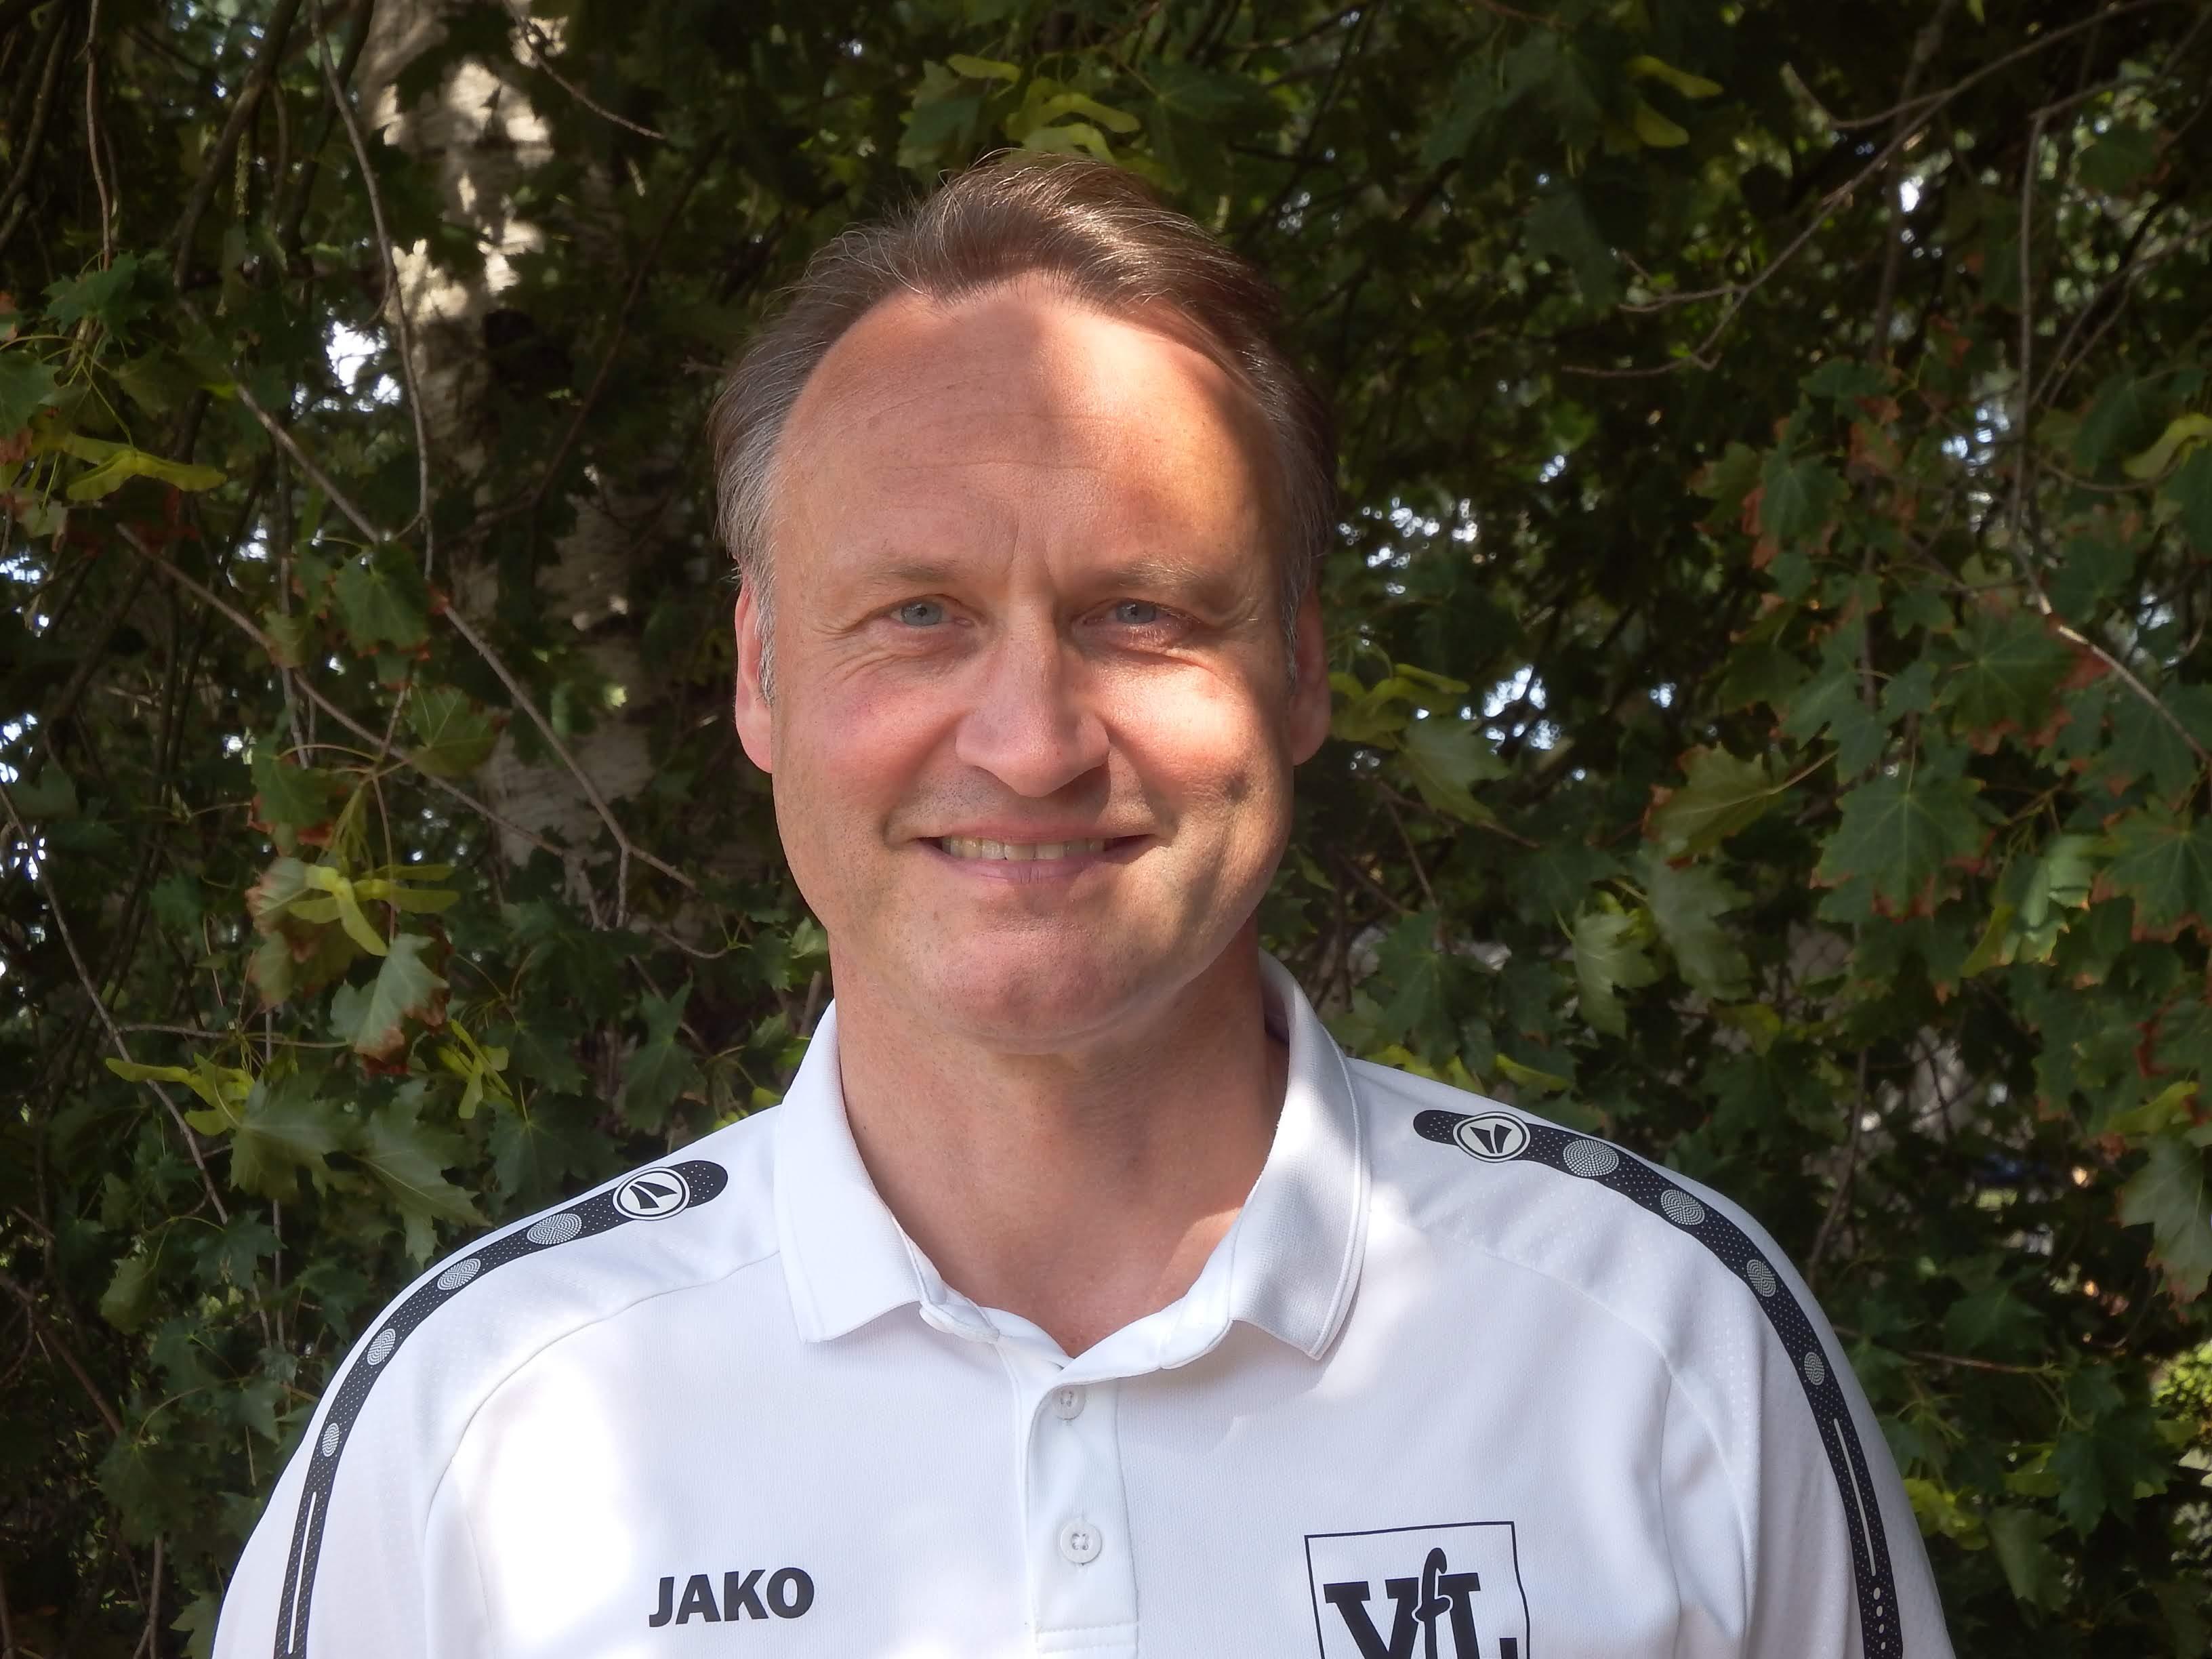 Axel Güllert